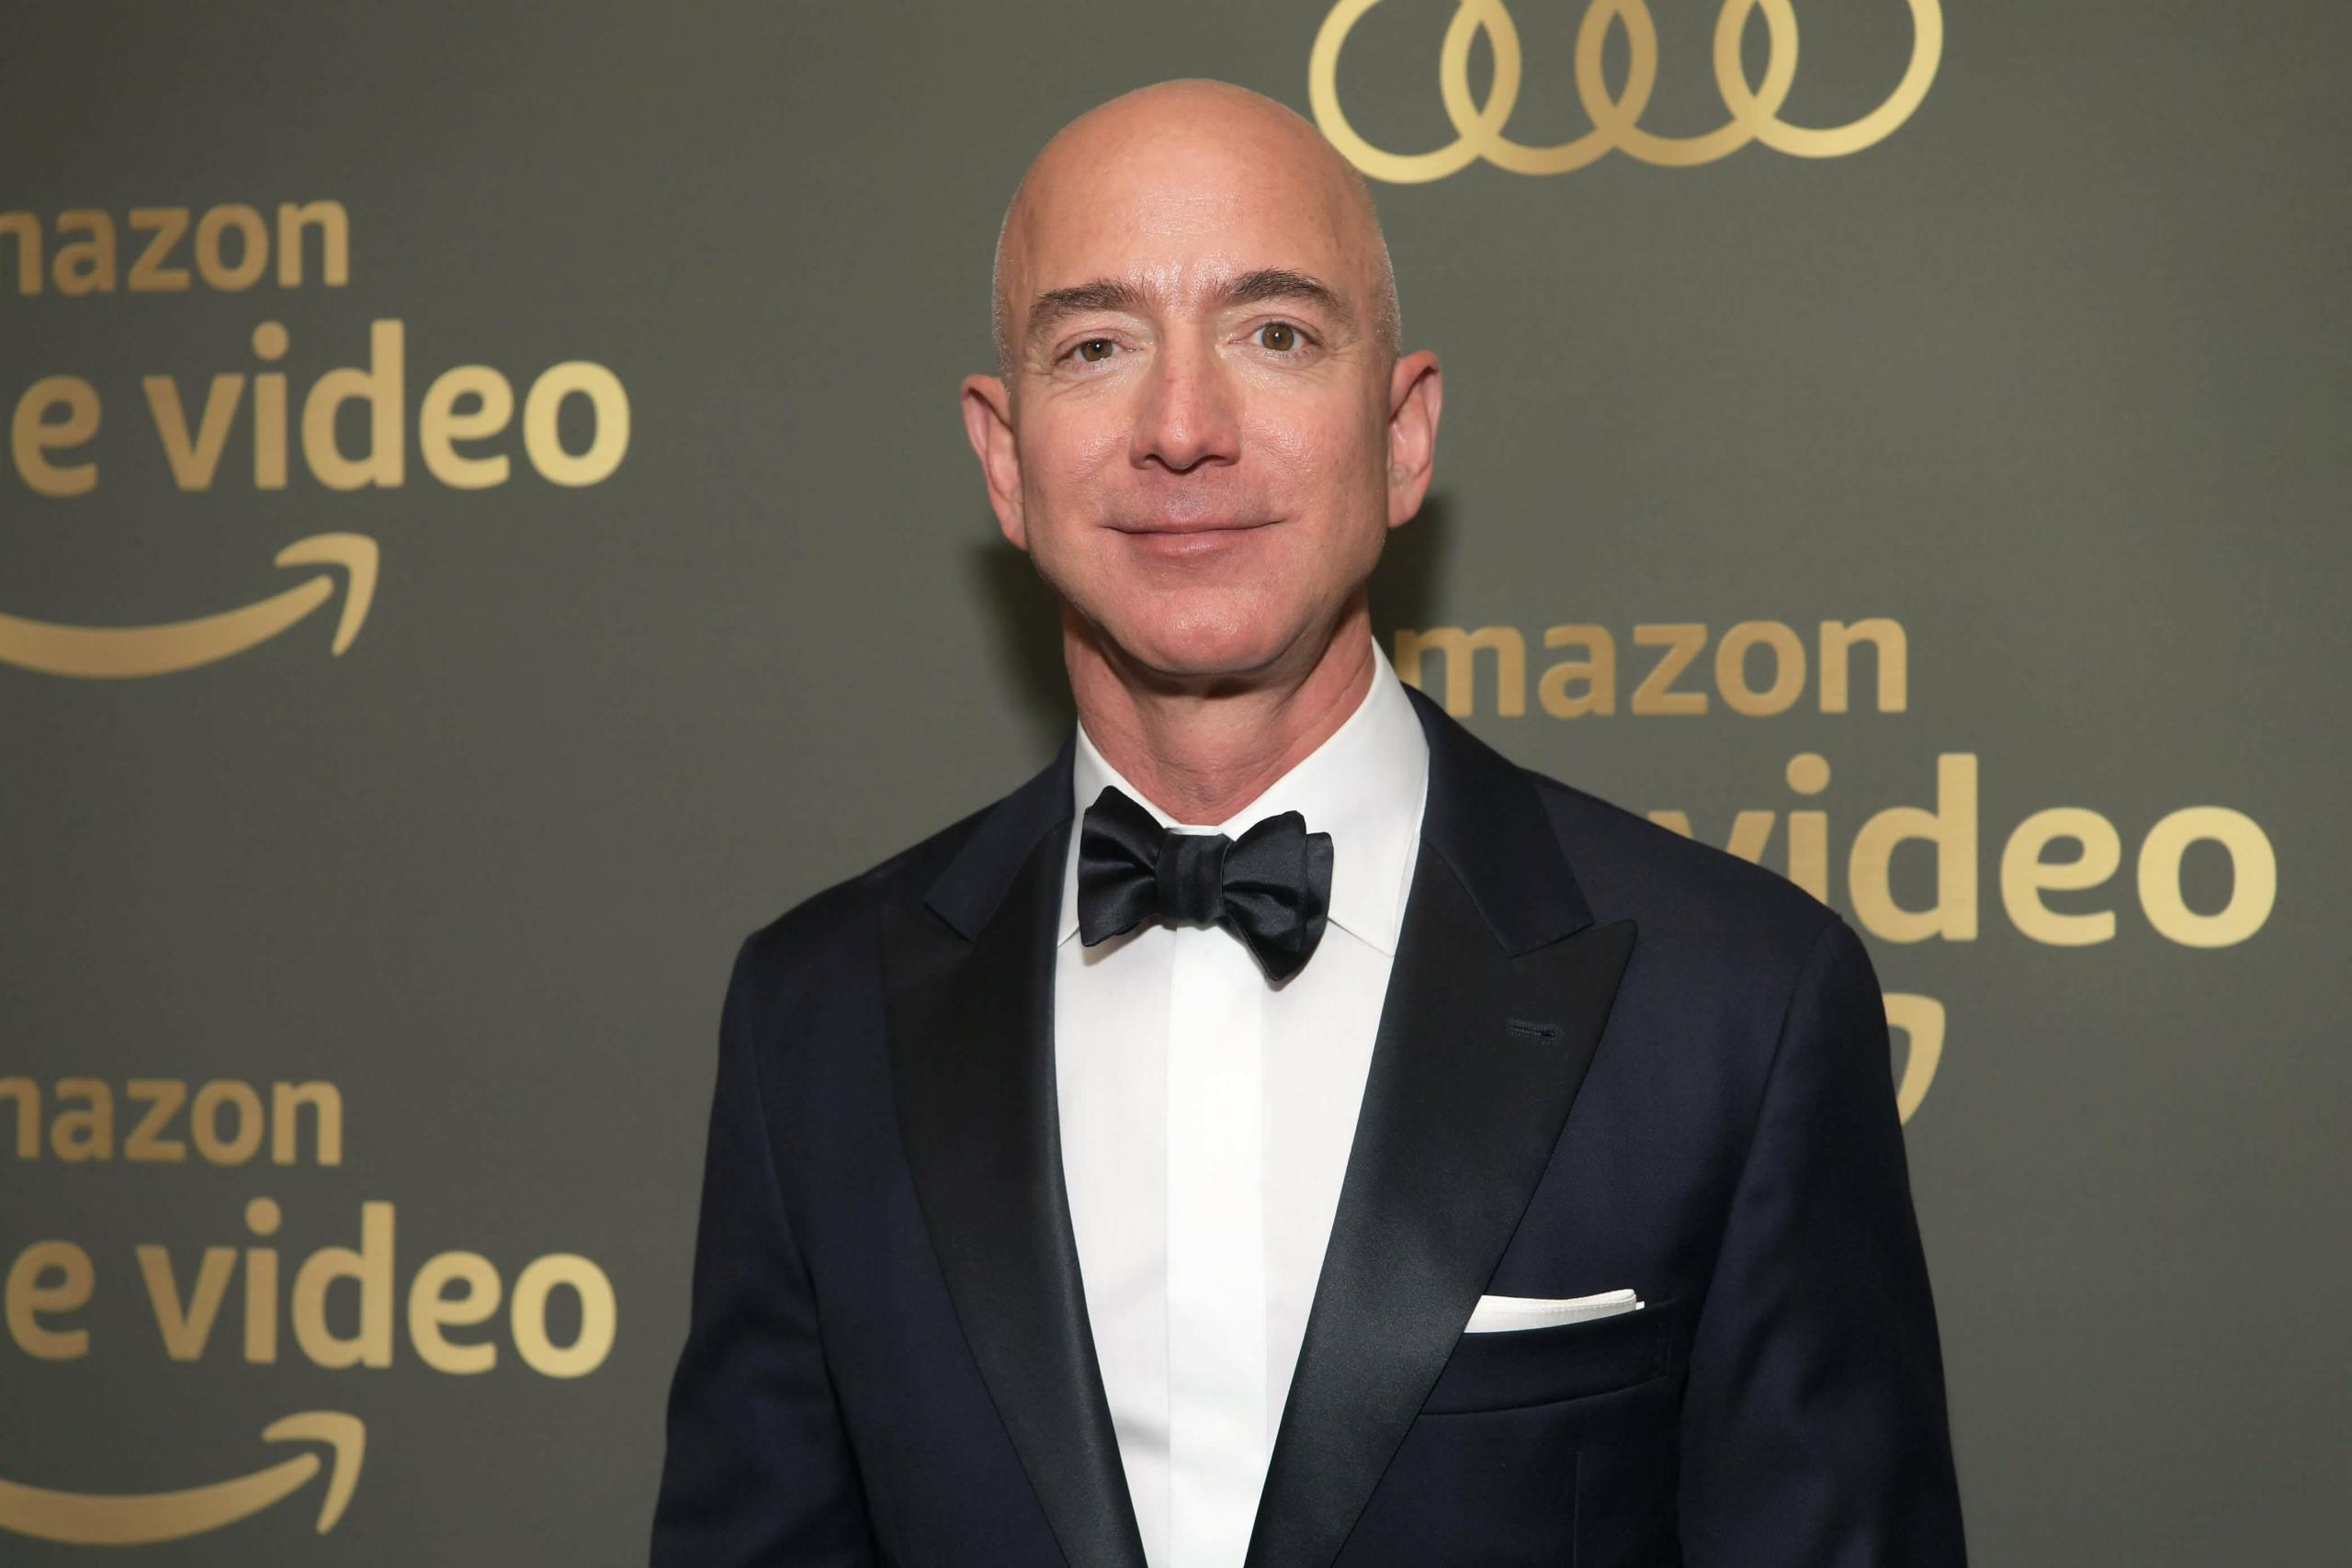 Rahasia Bisnis Jeff Bezos oleh Coach Yohanes G. Pauly